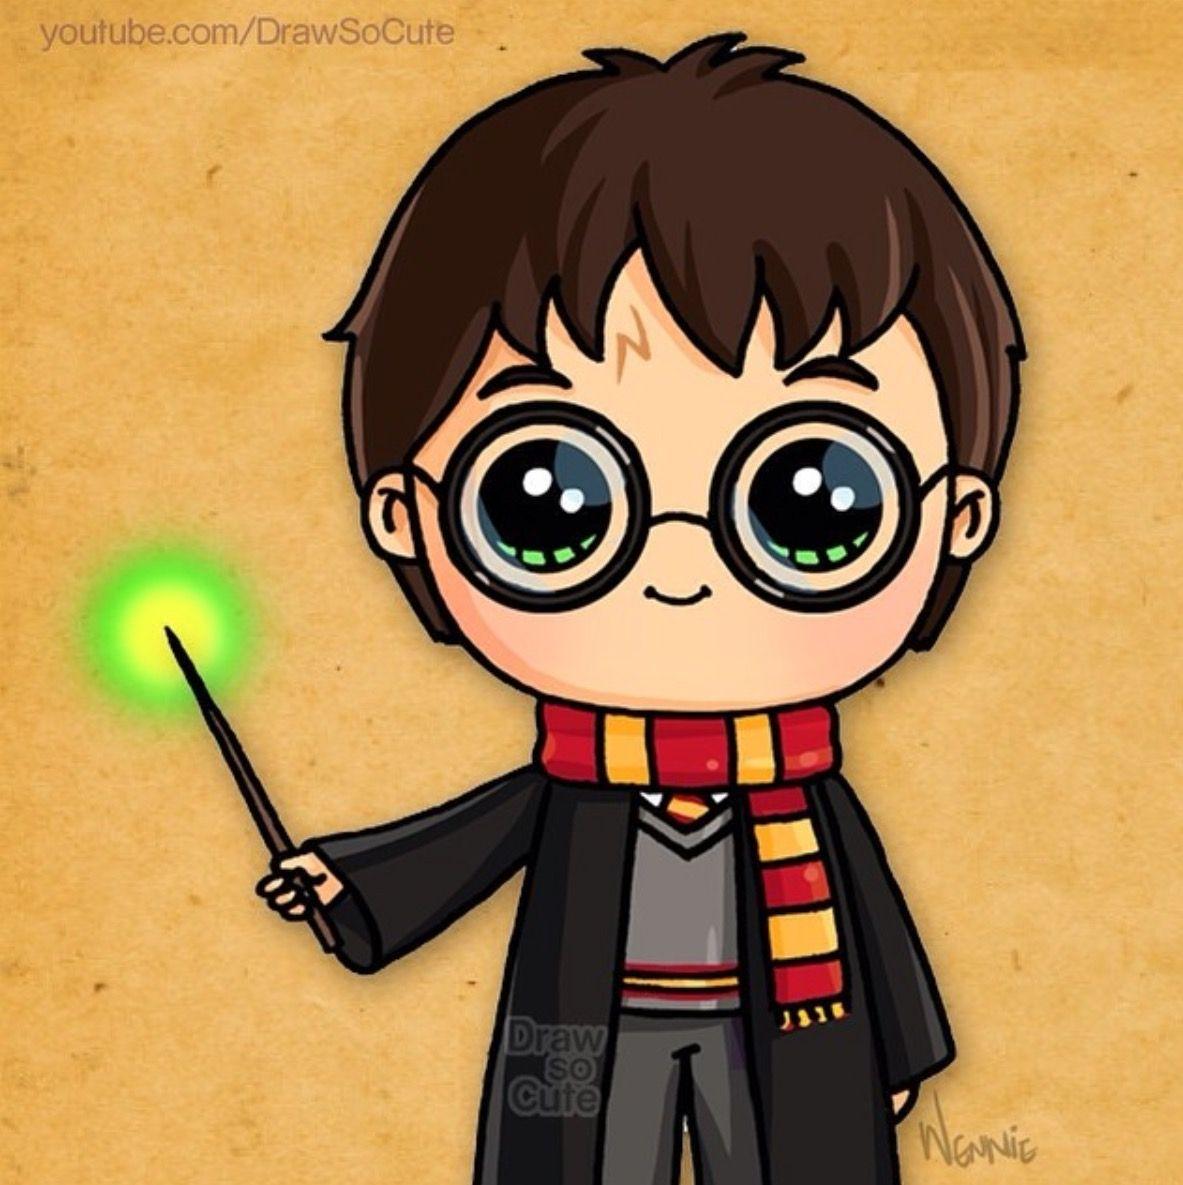 Pin De Tp5790 Em Harry Potter Desenhos Kawaii Kawaii Desenhos